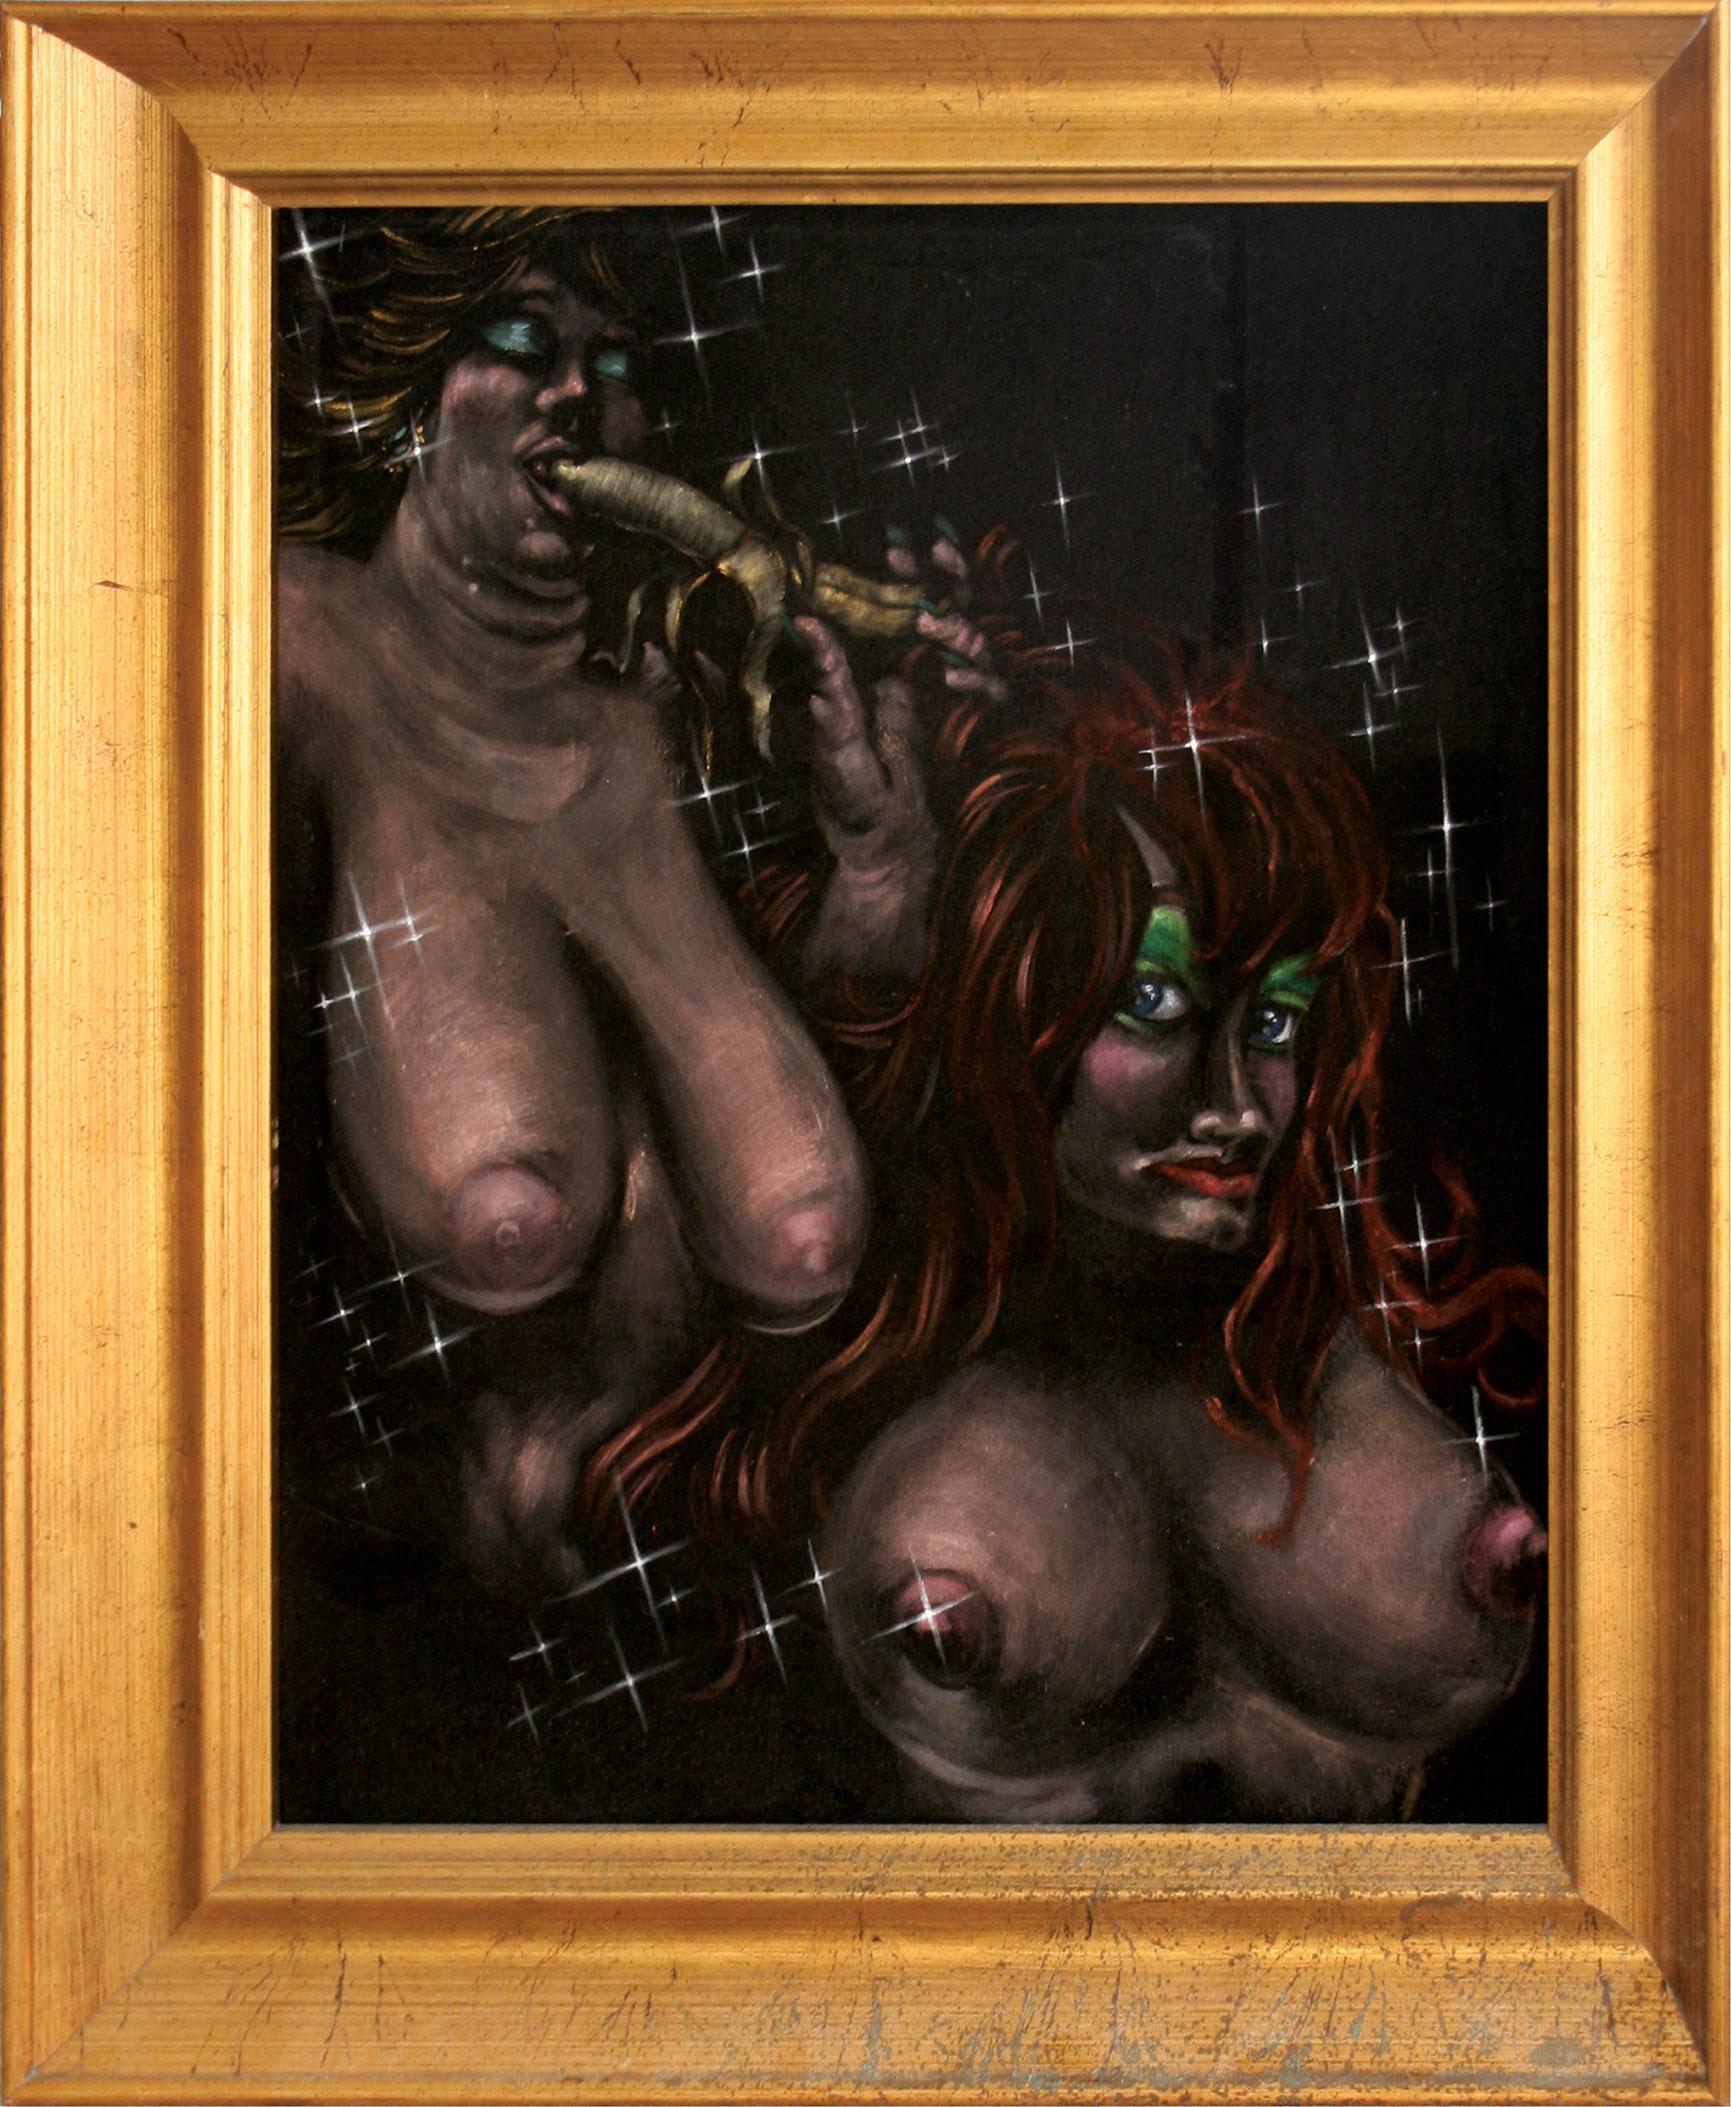 Christopher Brand & Mackie Jurray. Fantasies? 2007 - acrylic on velvet. 2' x 1.5'.